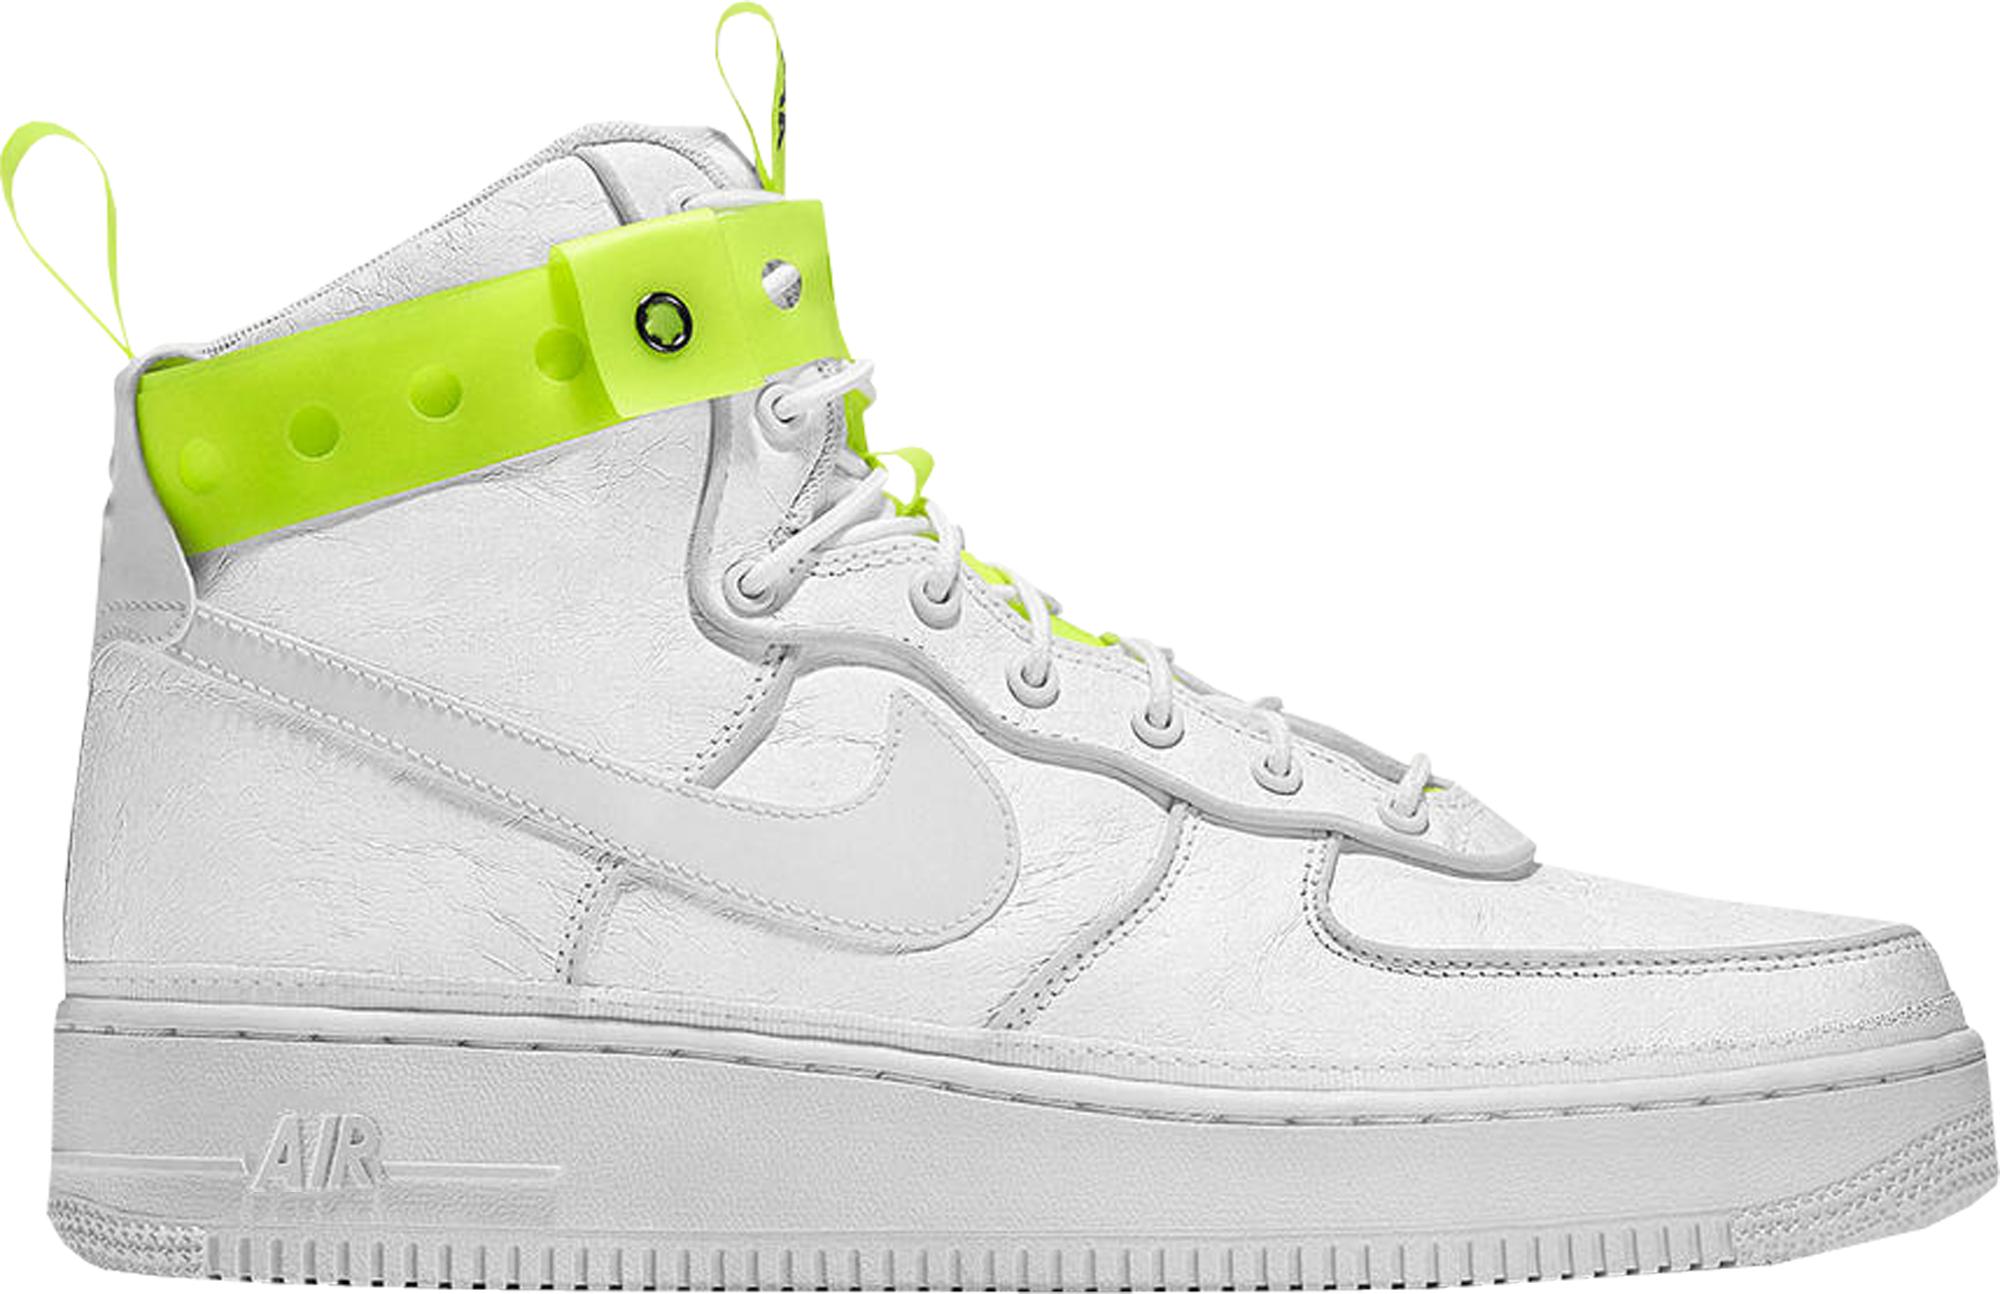 Nike Air Force 1 High Magic Stick VIP